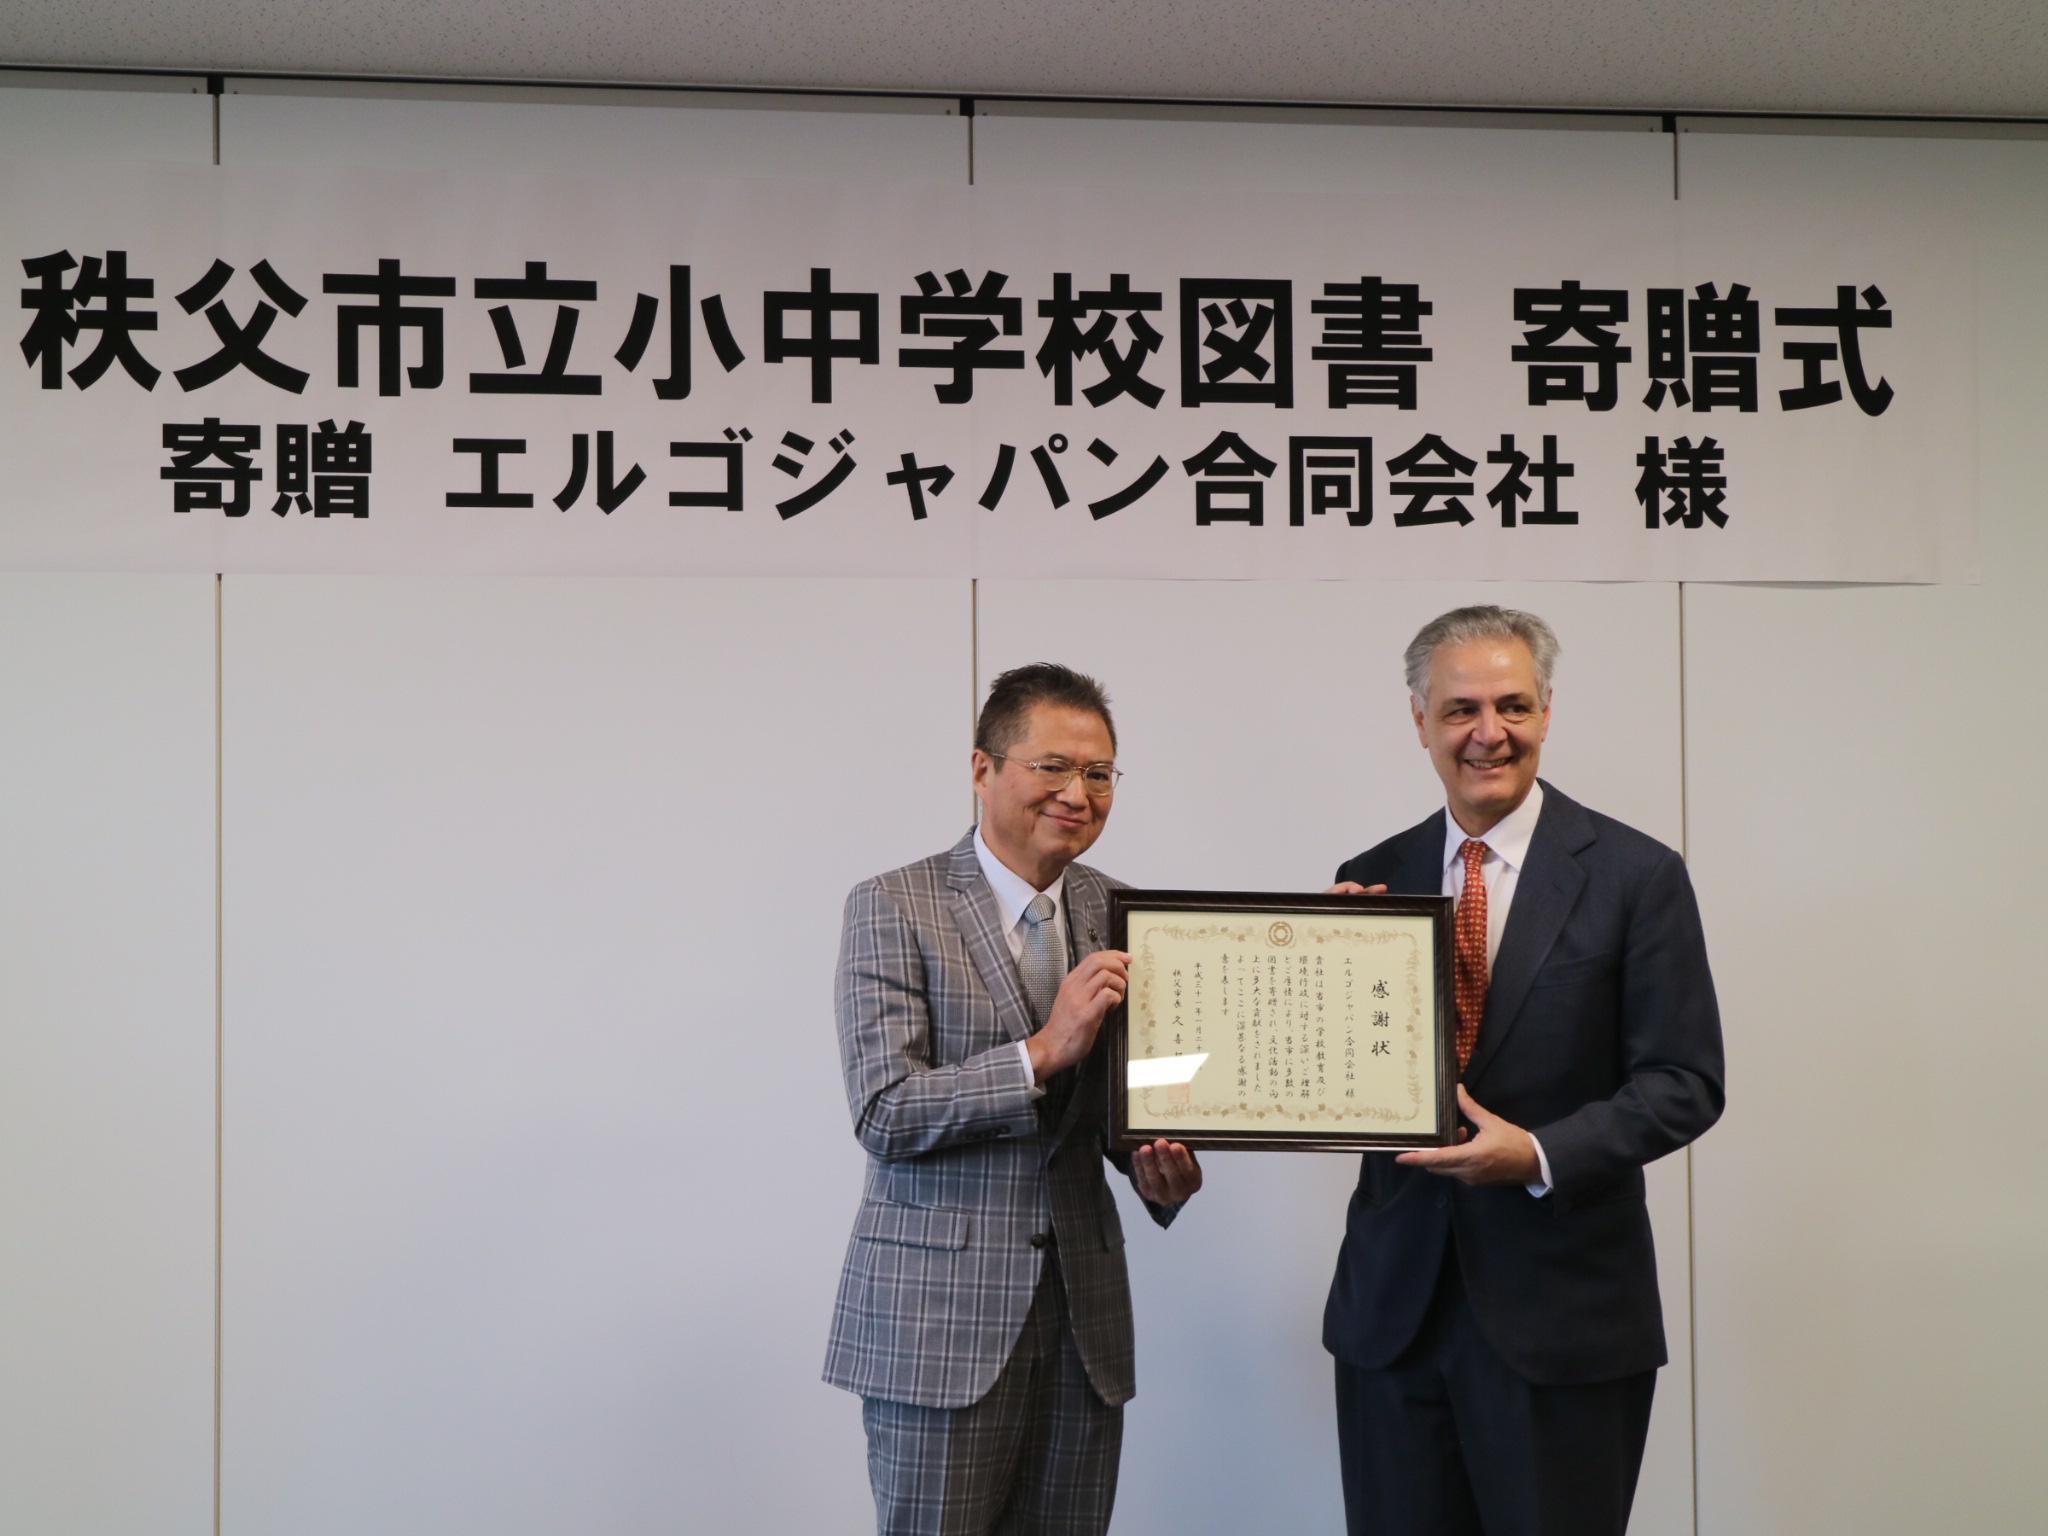 Kuniyasu Kuki Mayor, Chichibu - Pier Francesco Rimbotti President, Infrastrutture S.p.A.